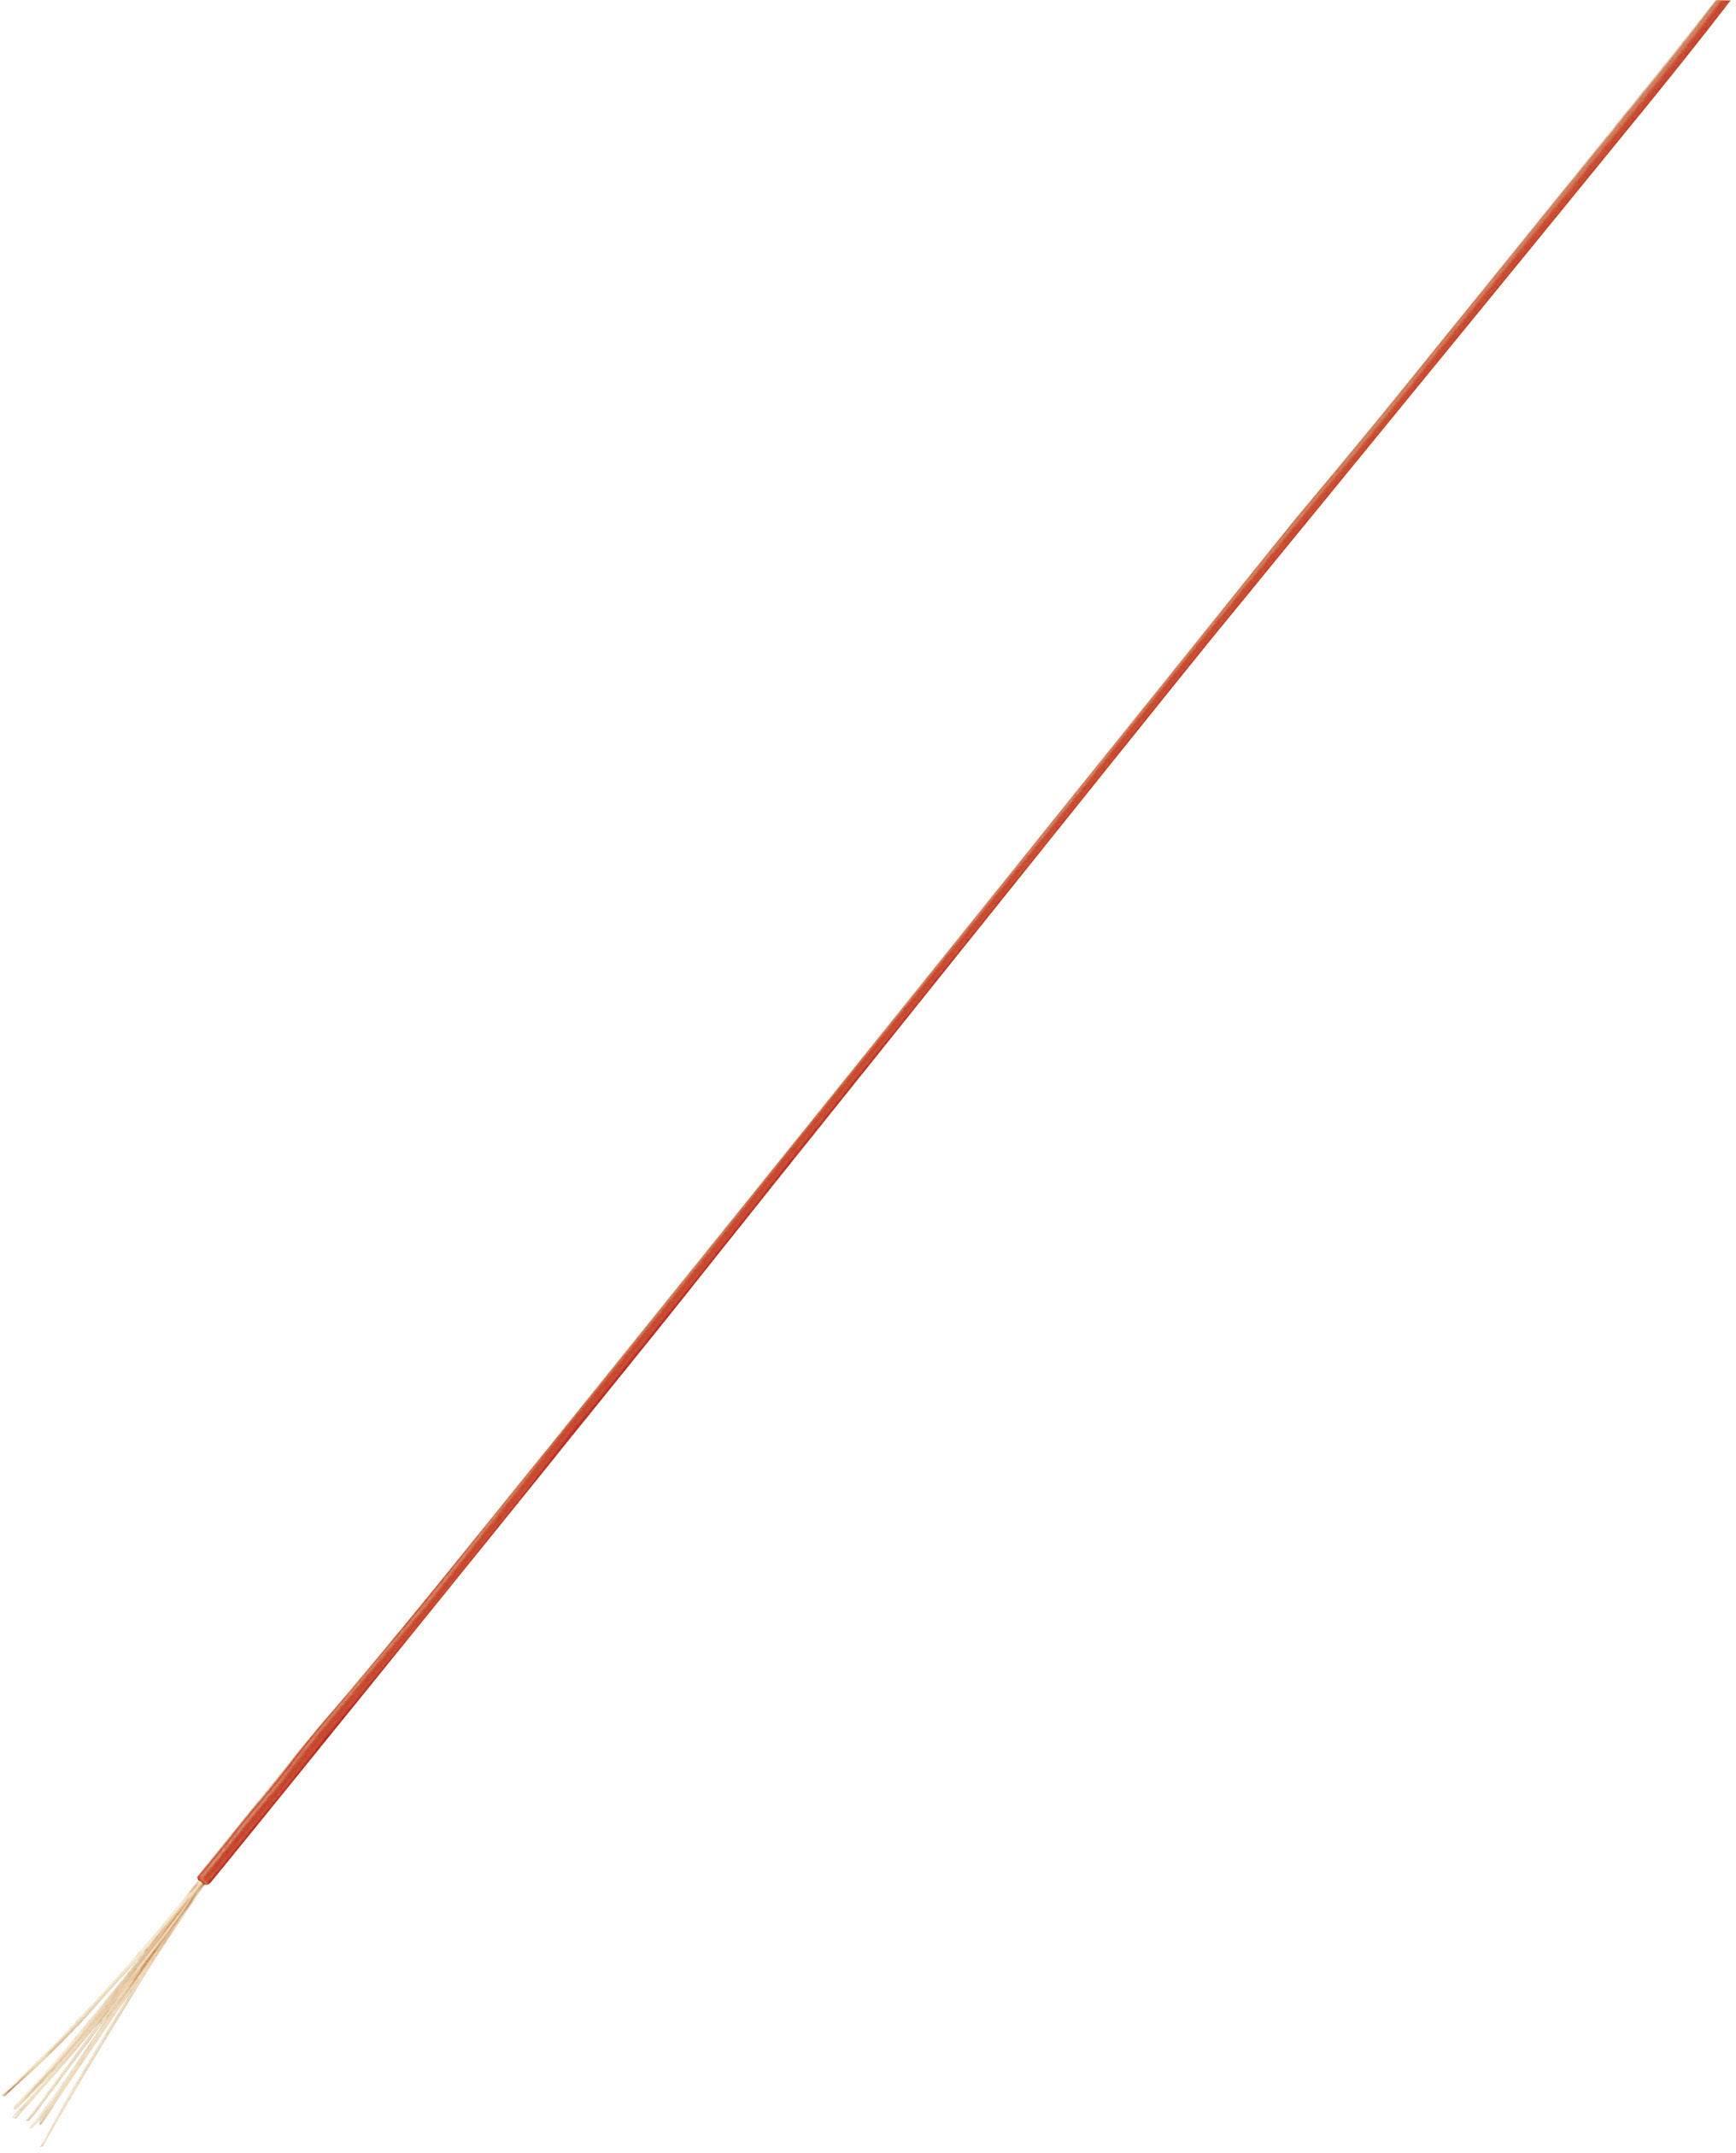 Opletenie / lanko Conrad Components 1180251 LiFY, 1 x 0.05 mm², vonkajší Ø 0.80 mm, 10 m, červená